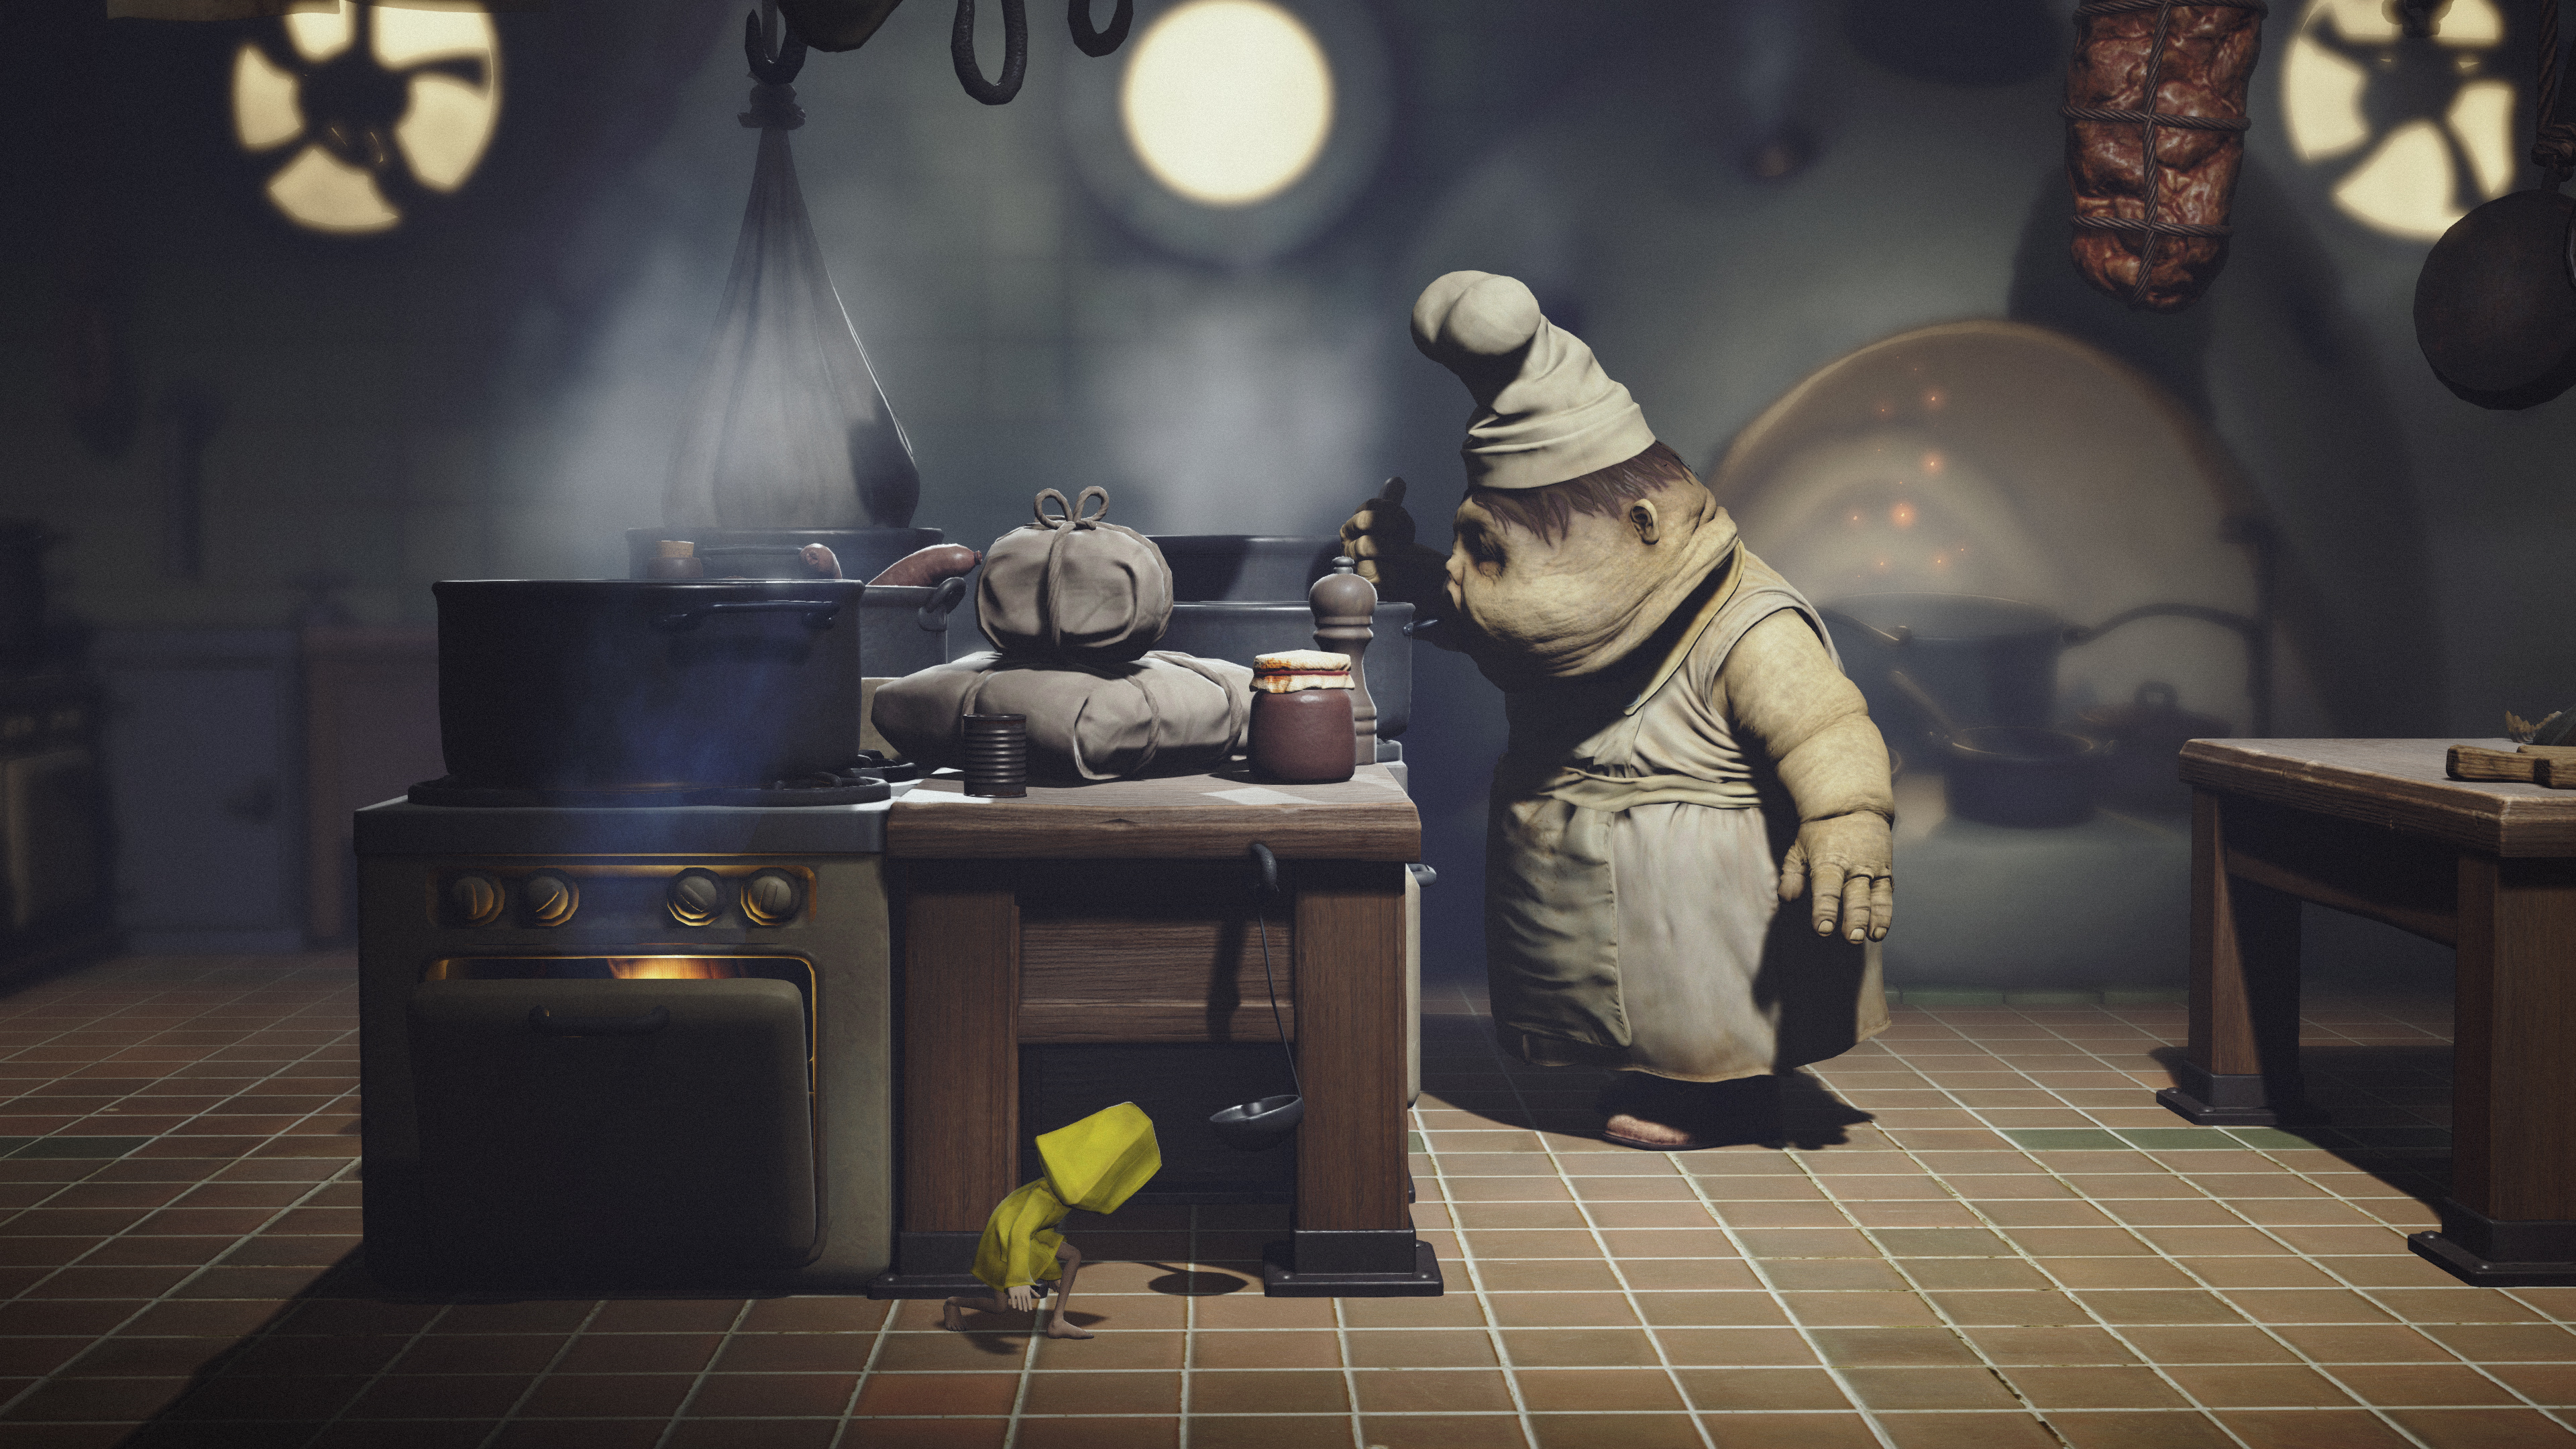 Little Nightmares 4k Ultra HD Wallpaper   Background Image ...